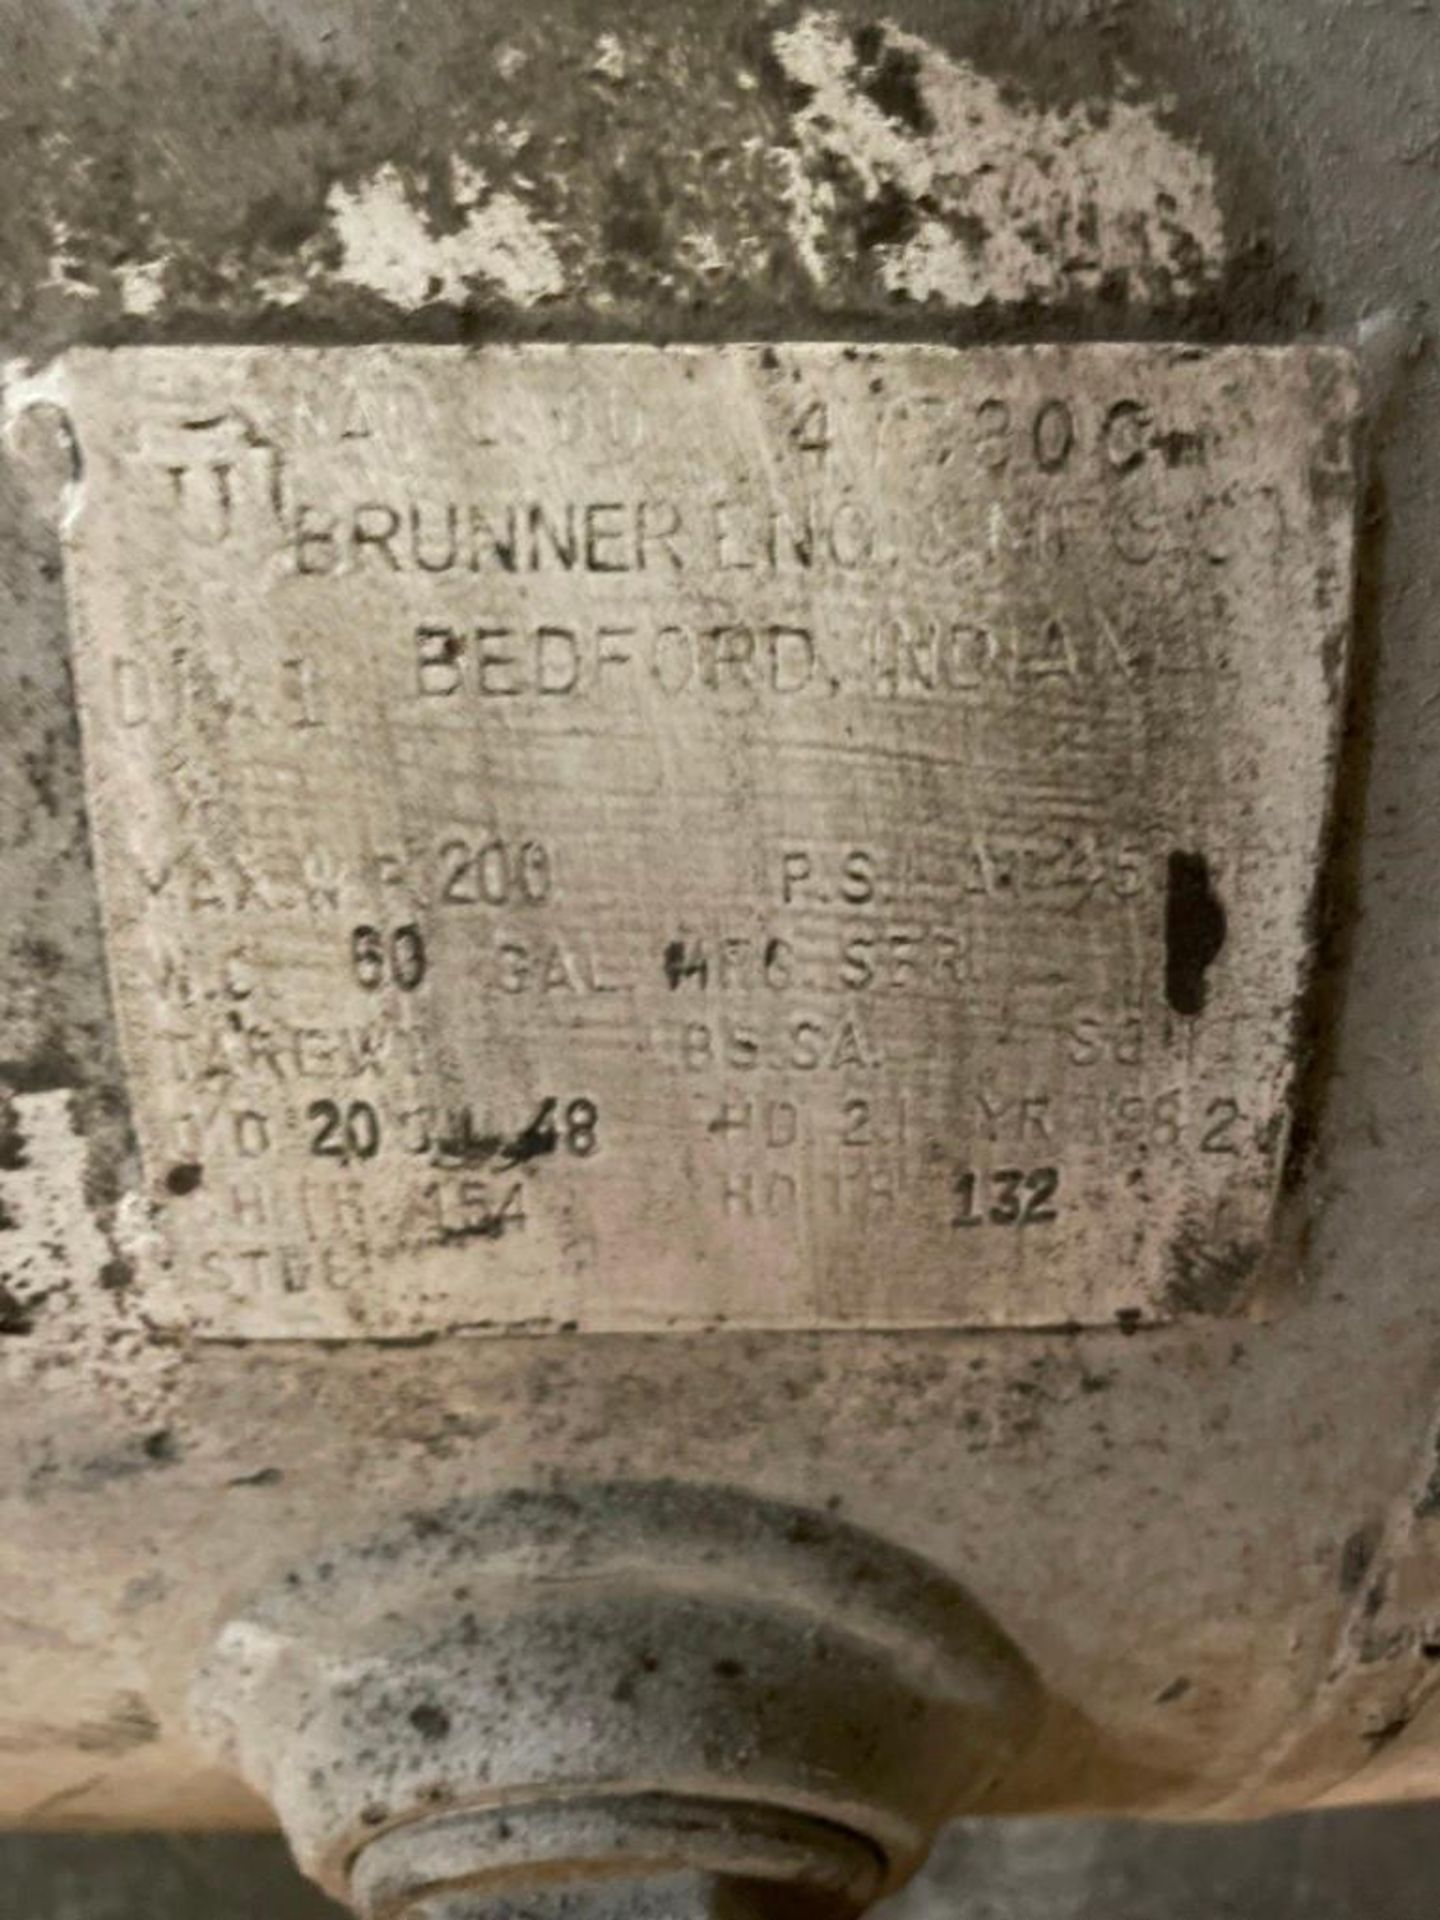 60 Gallon Brunner Air Surge Tank - Image 5 of 5